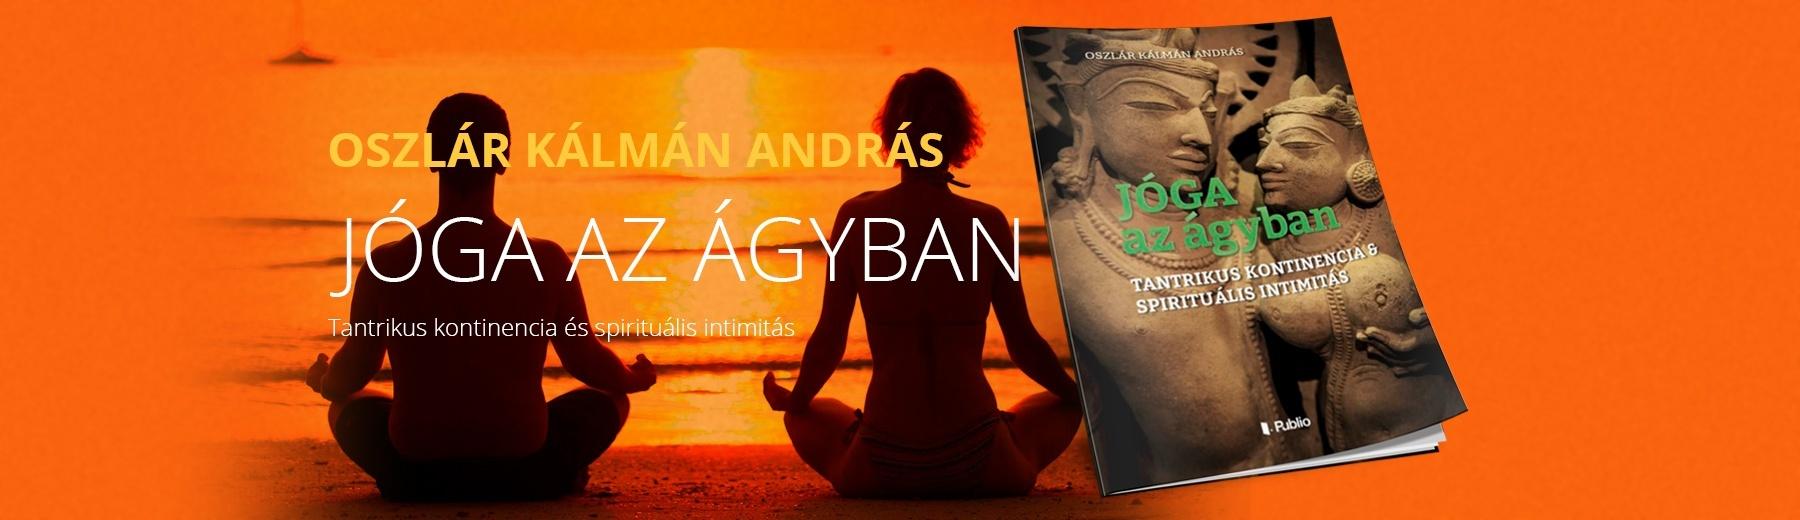 http://admin.konyvaruhaz.info/media/files/joga@2x.jpg